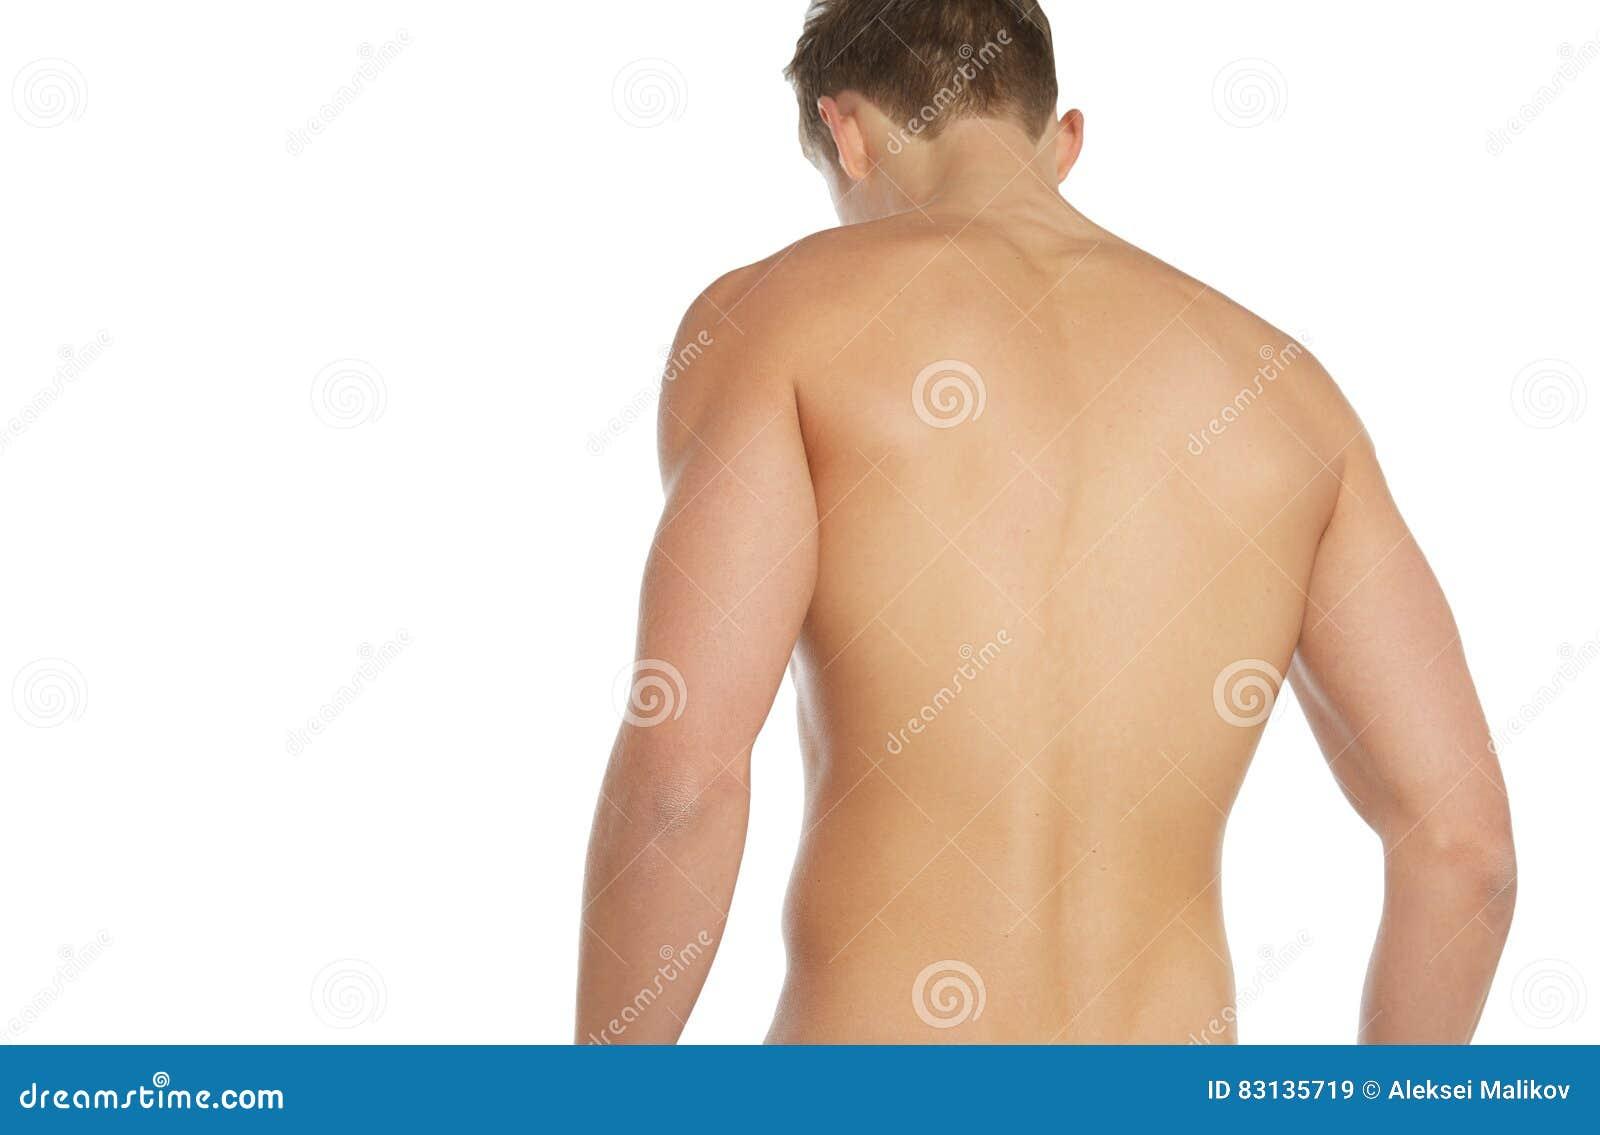 Naked human body